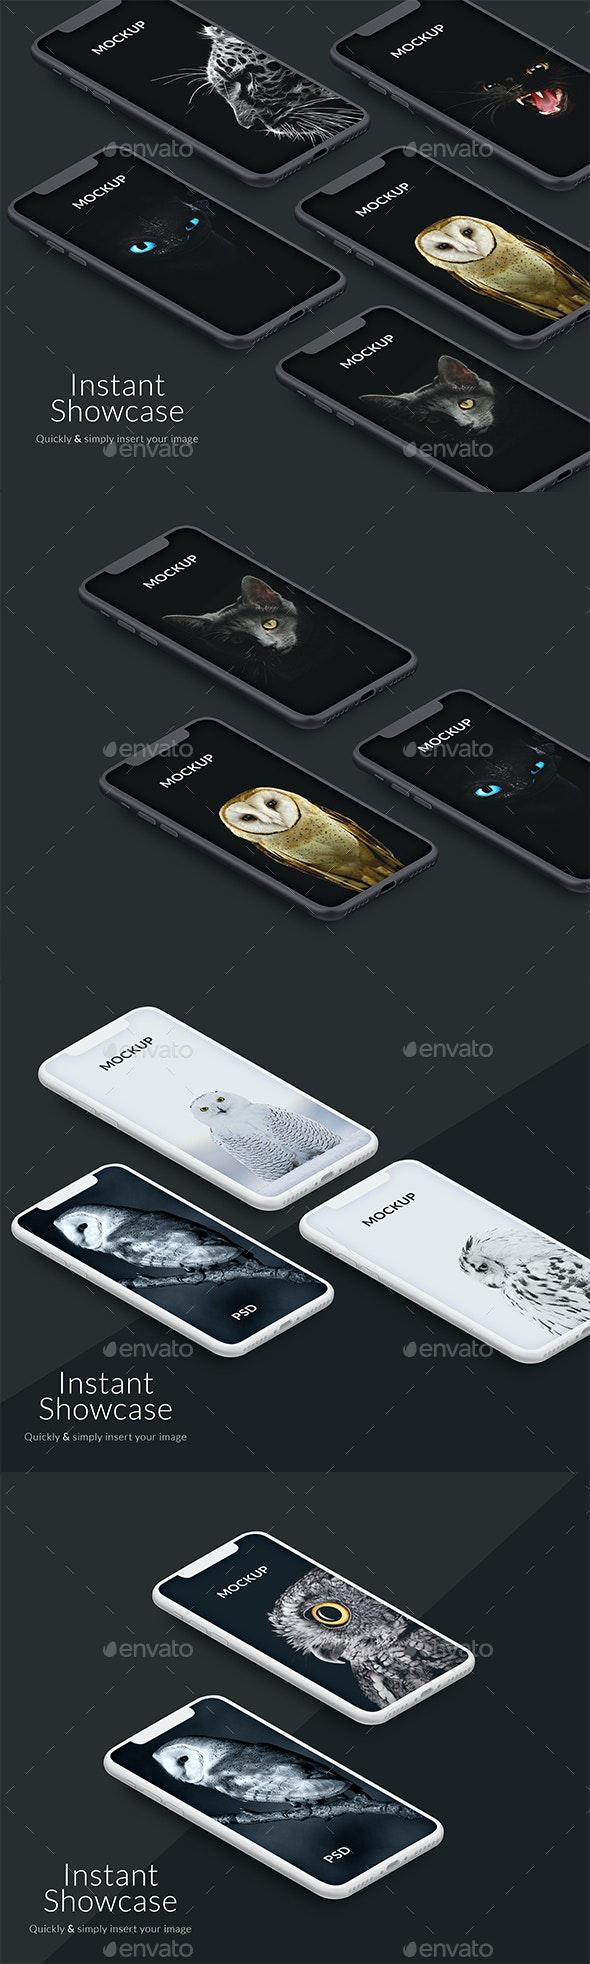 Perspective Iphone X Mockup - Product Mock-Ups Graphics